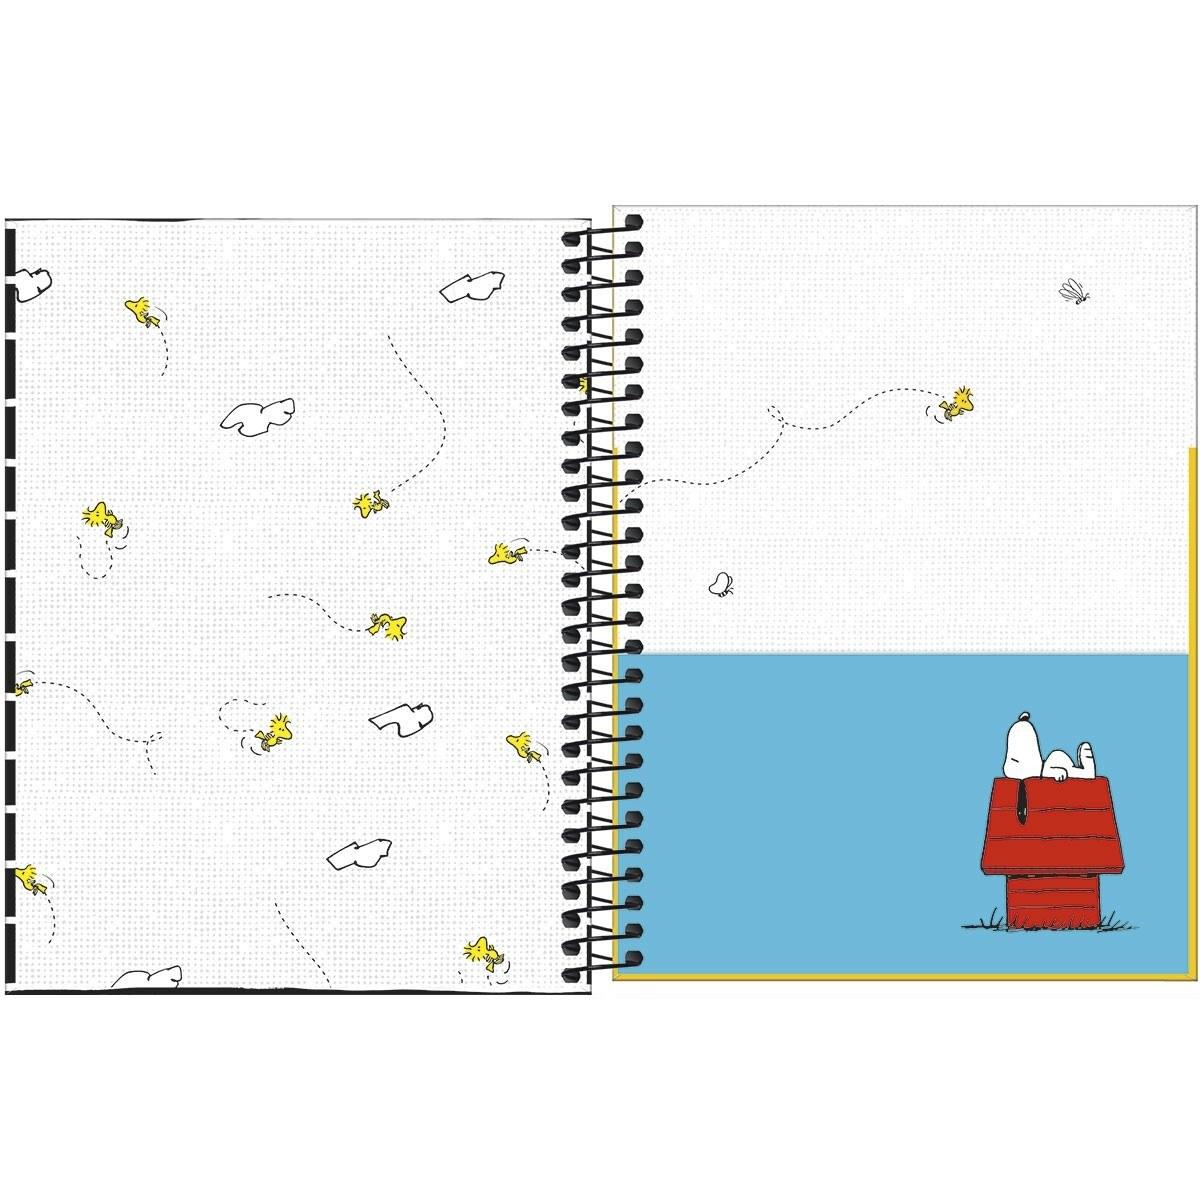 Caderno Espiral Capa Dura Colegial 10 Matérias Snoopy 160 Fls - Tilibra